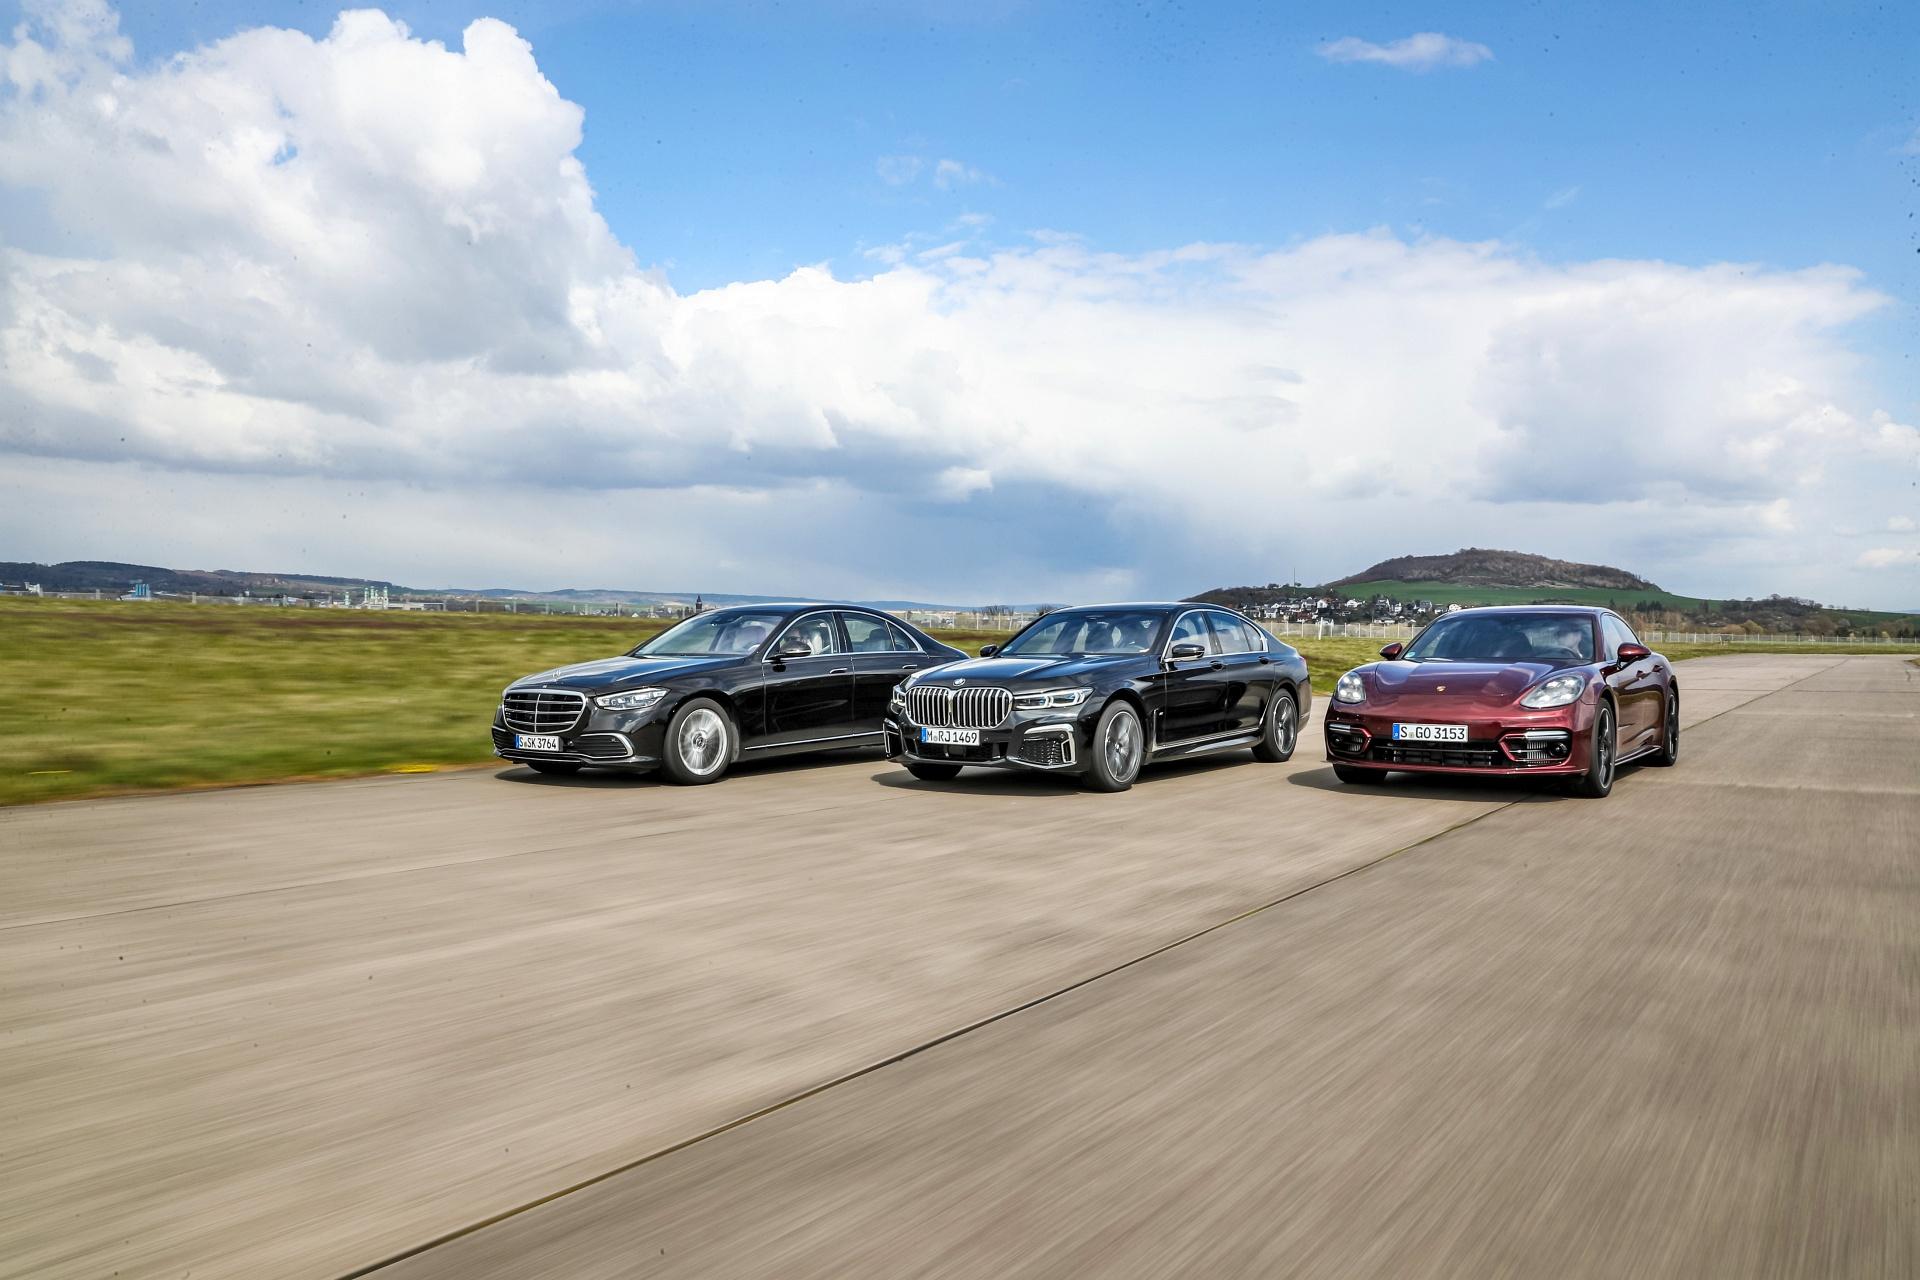 BMW 750i, Mercedes S500, Porsche Panamera 4S - przody